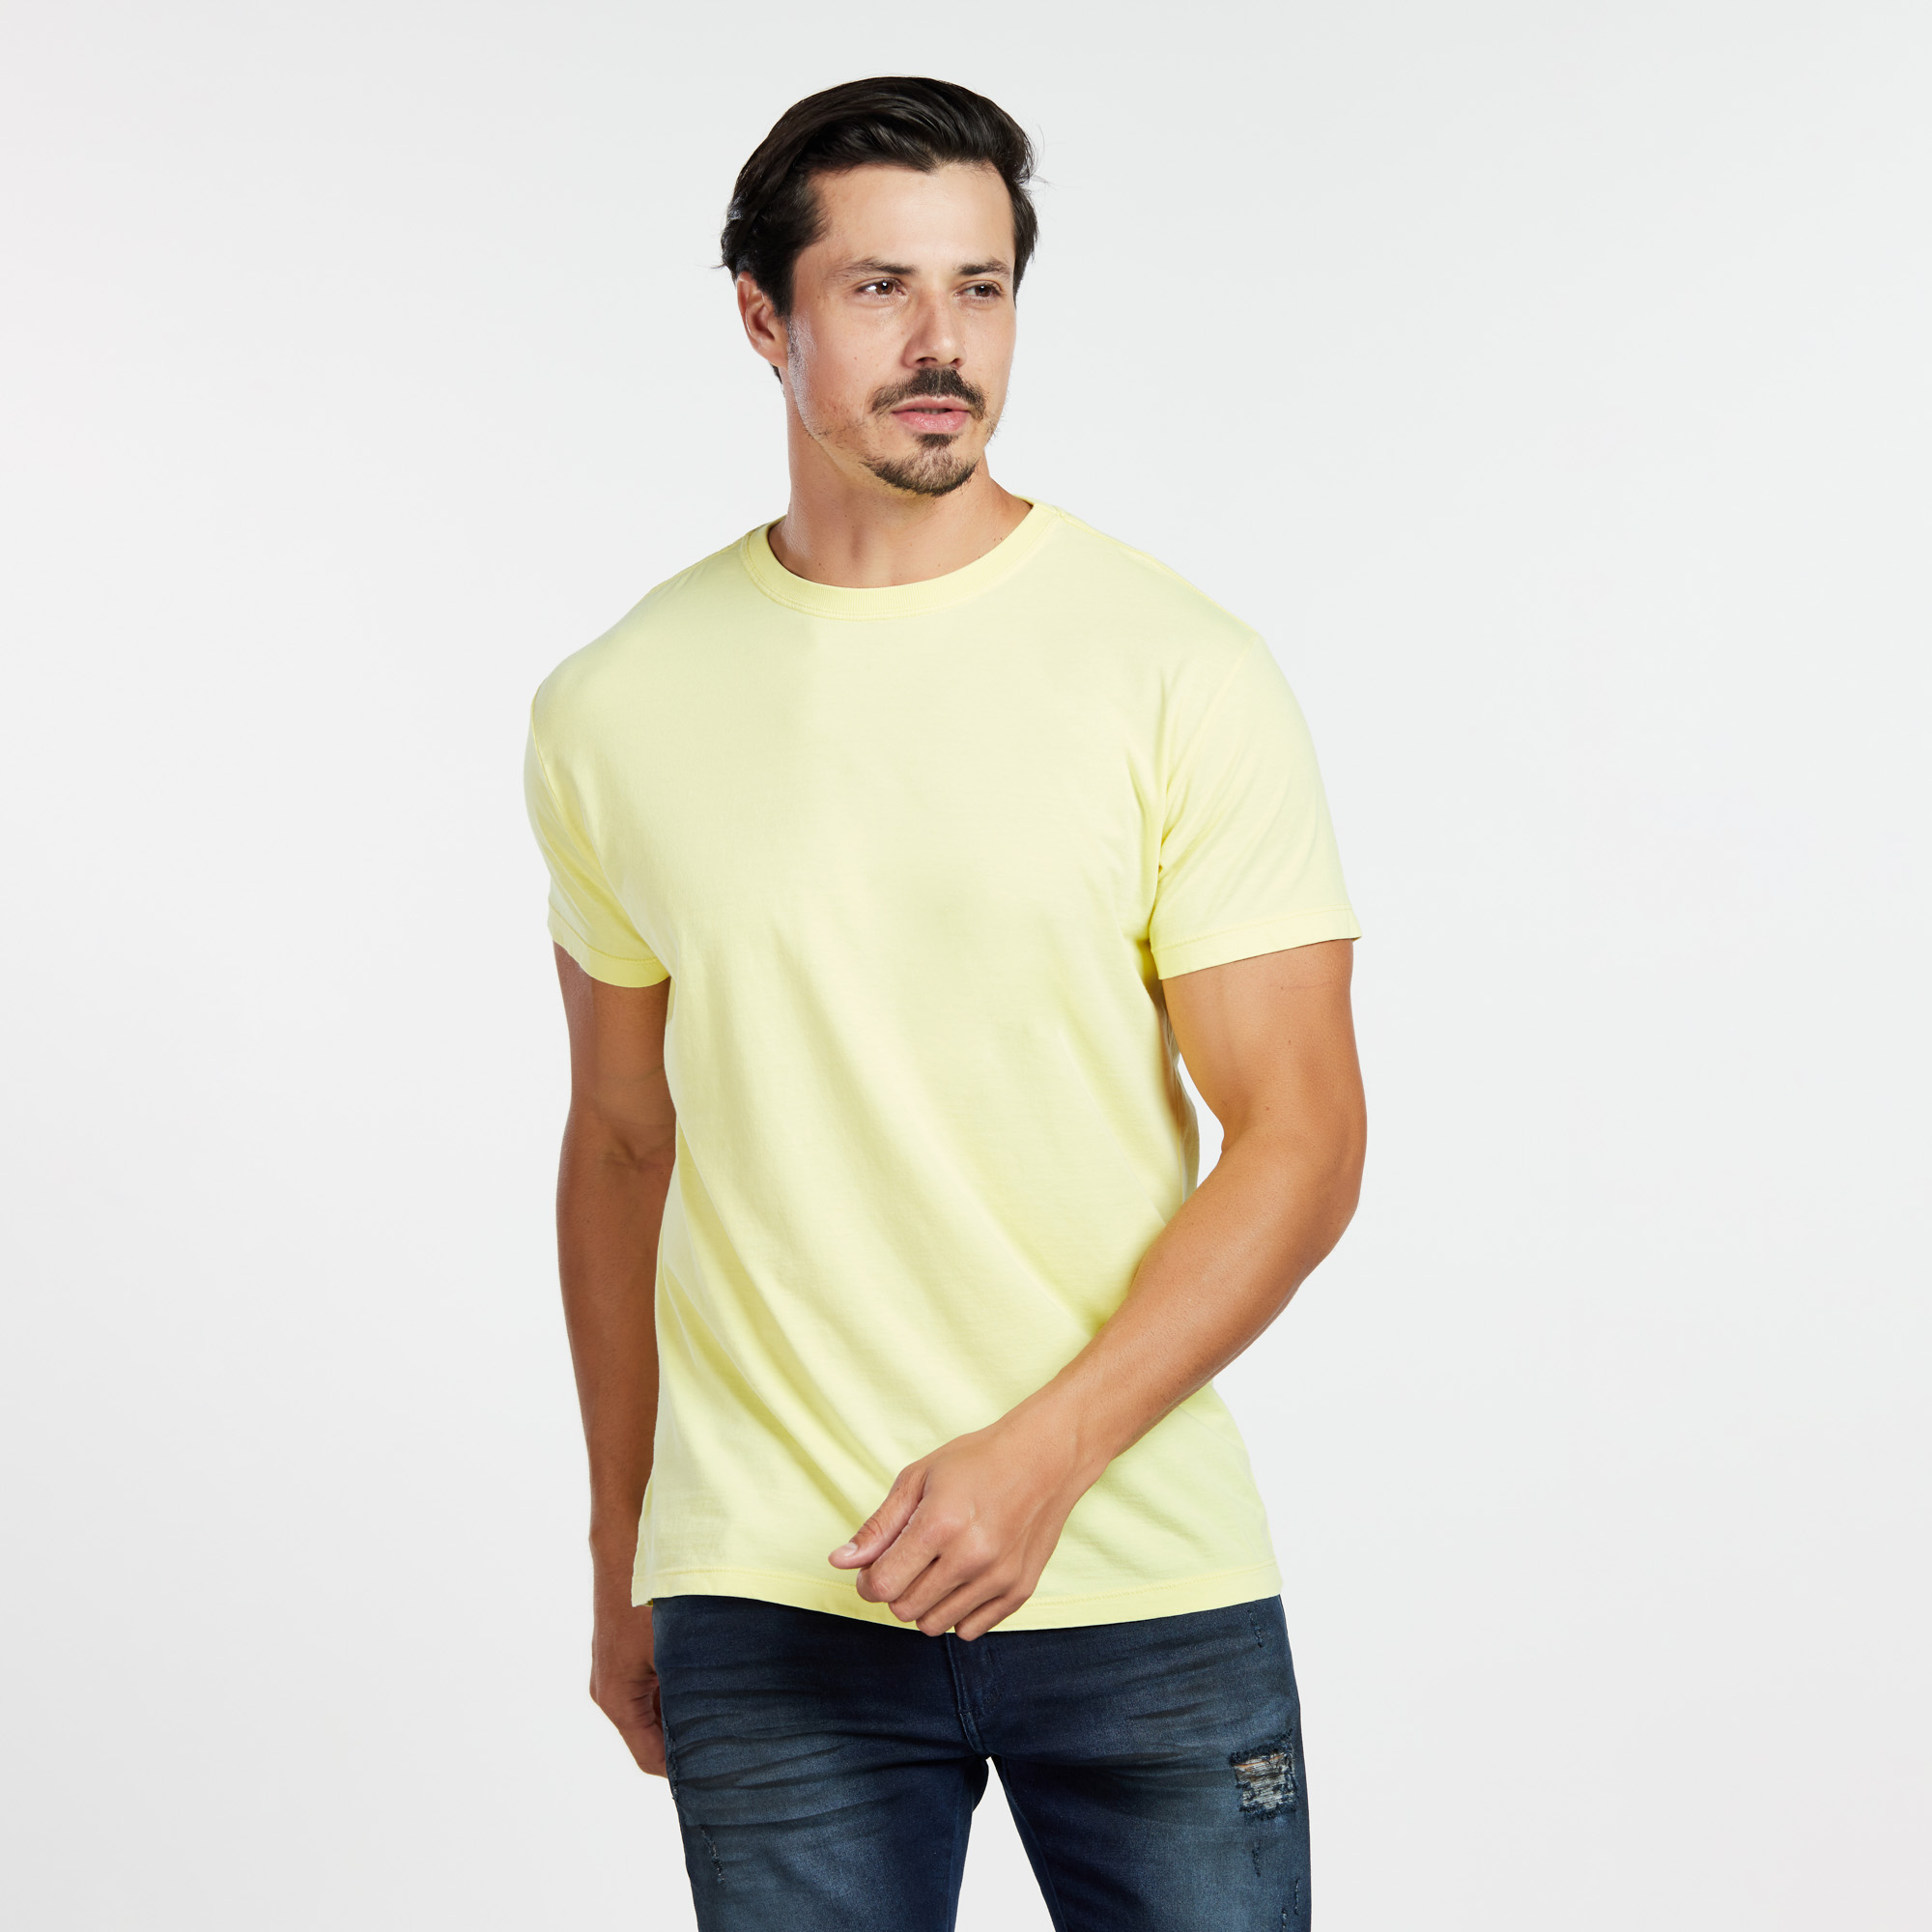 Camiseta Masculina Reativo Amarelo